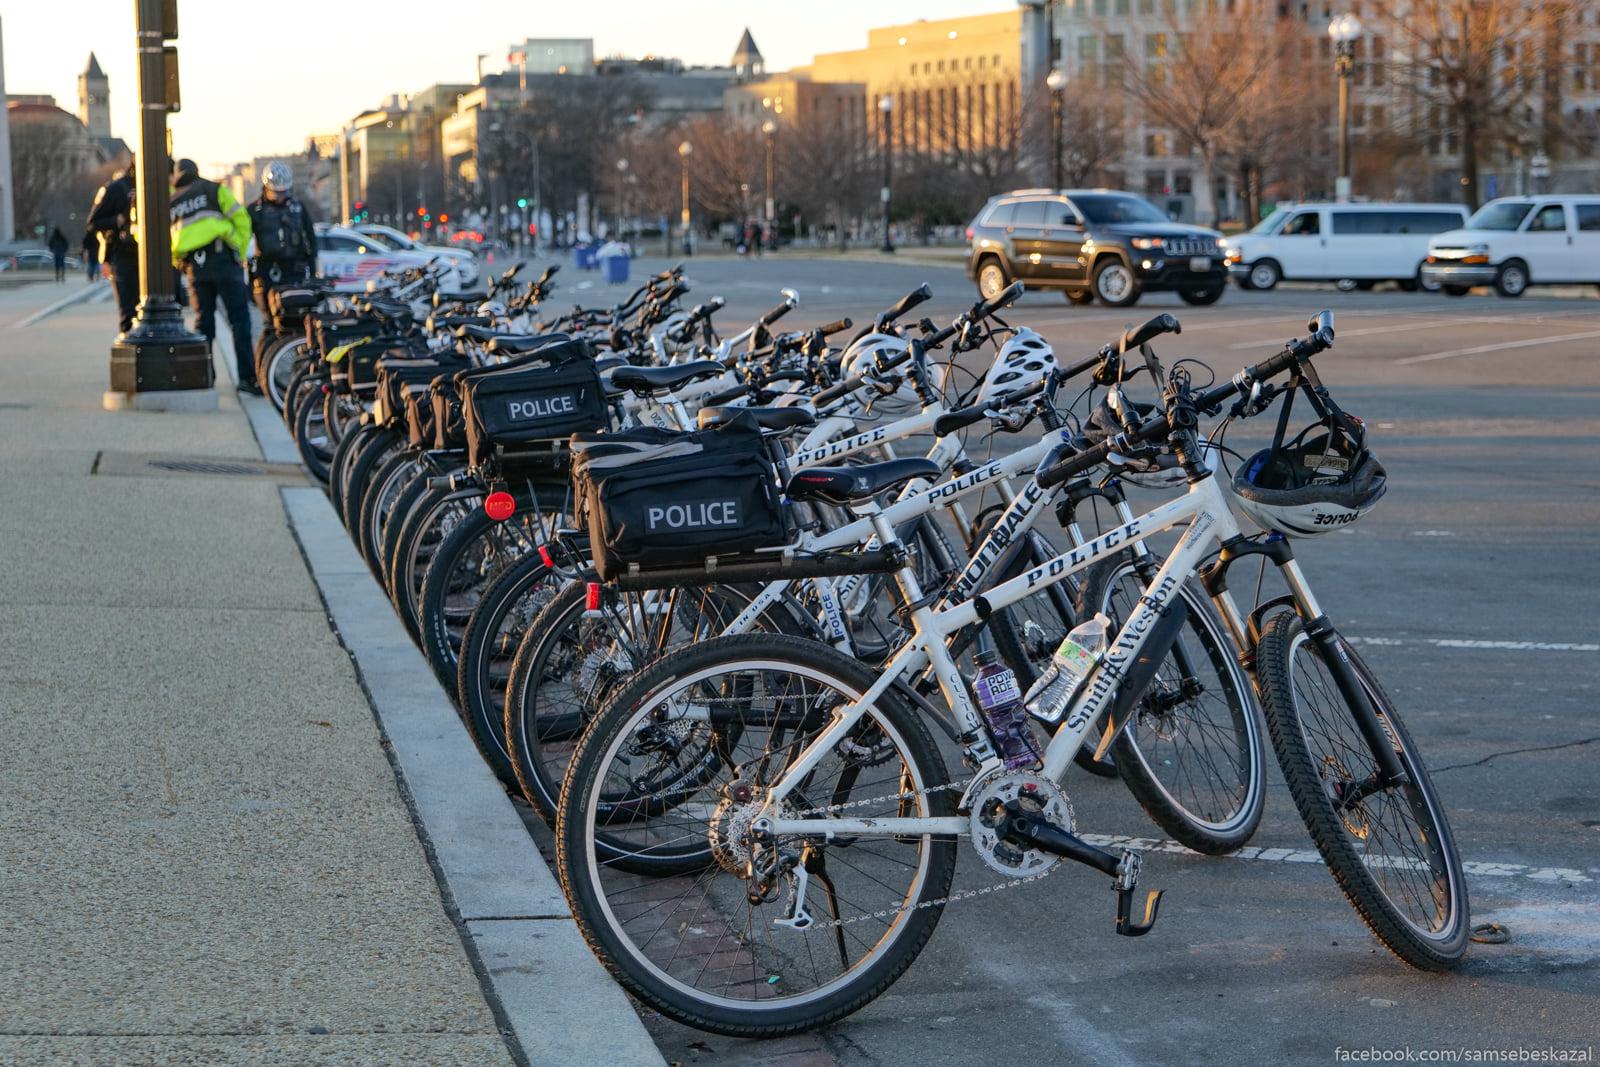 Policejskie velosipedy.